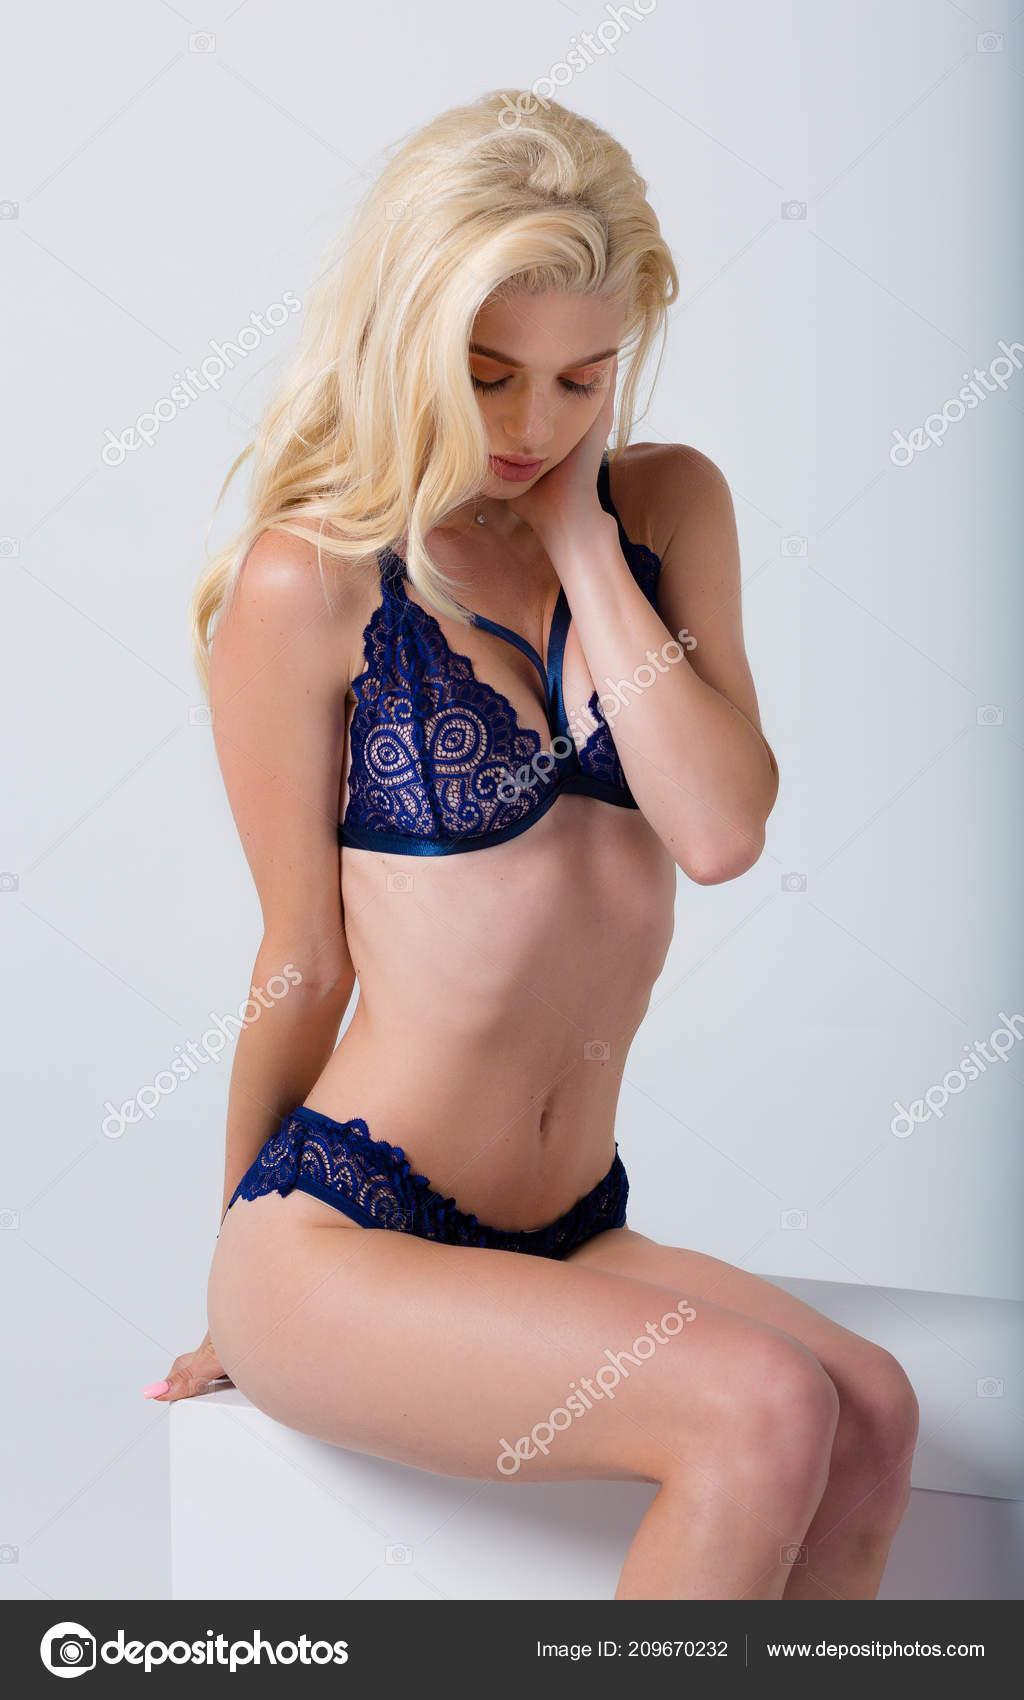 016af65ecfd Όμορφη Σέξι Γυναίκα Φορούσε Ένα Σέξυ Εσώρουχα — Φωτογραφία Αρχείου ...